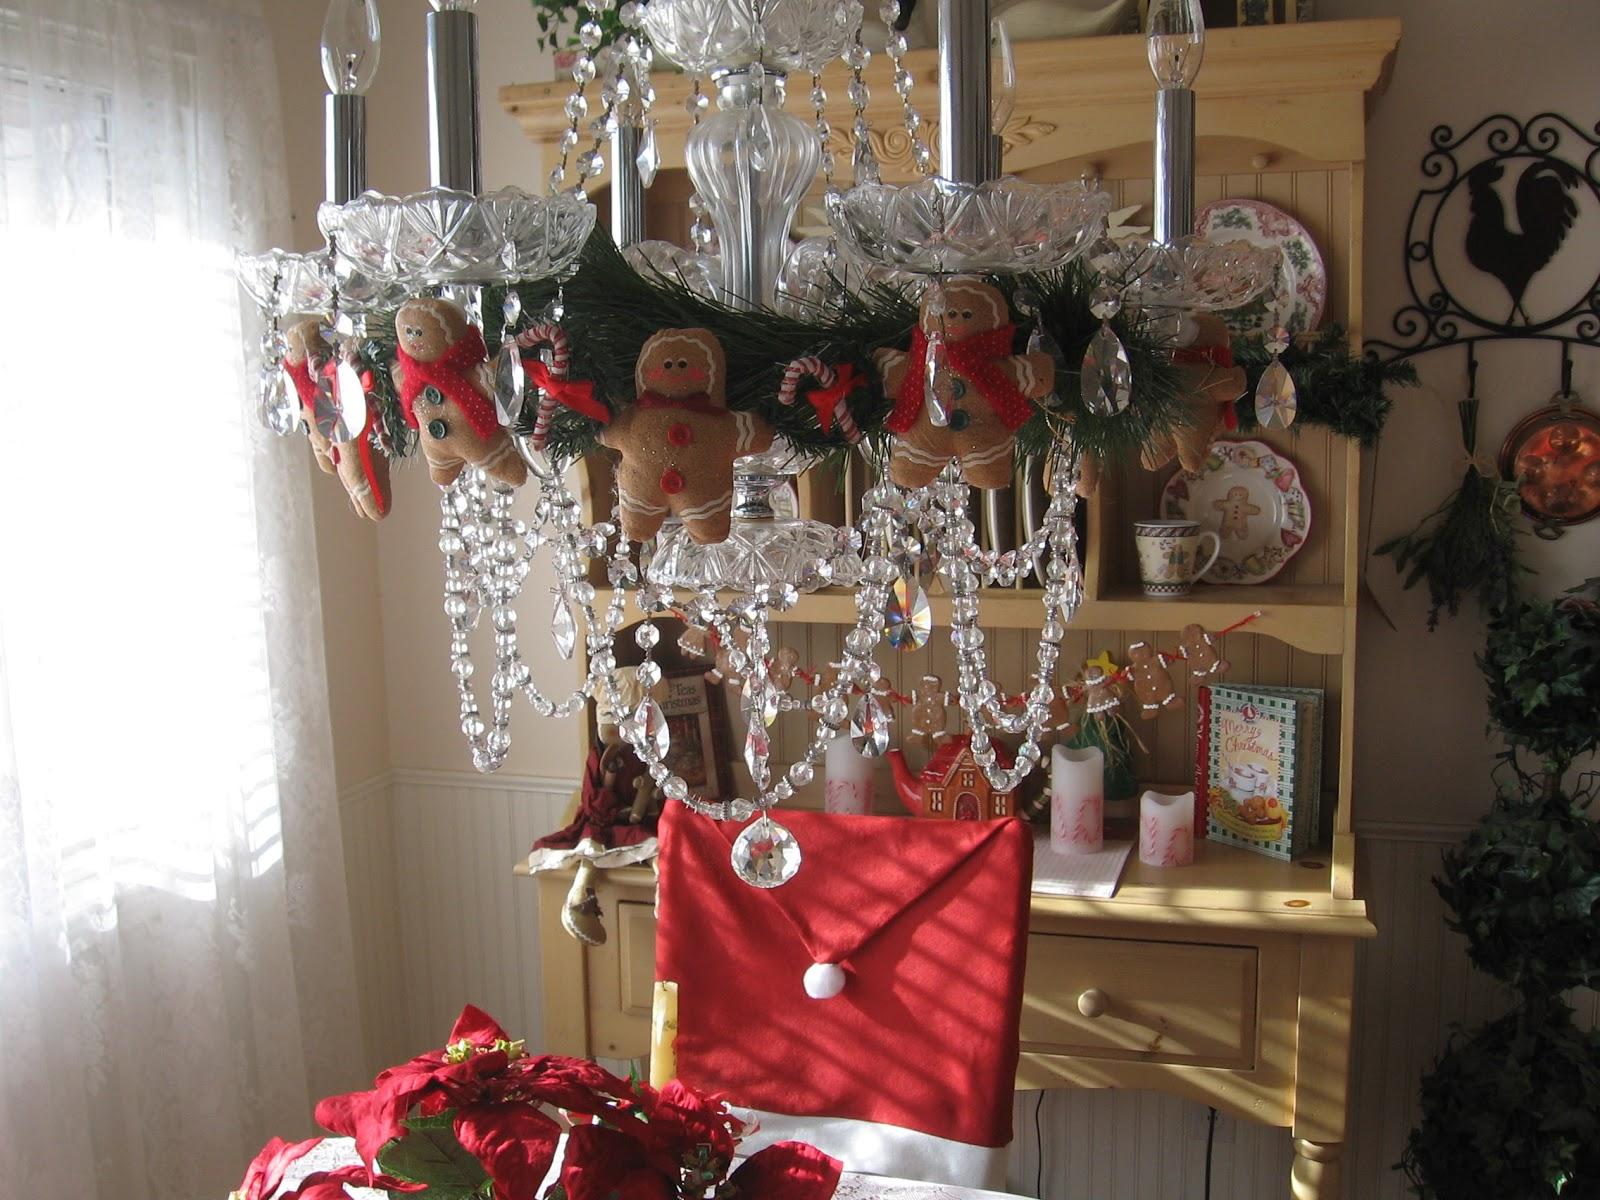 dollar tree bunny chair covers black hire english purple ribbon darling santa hat